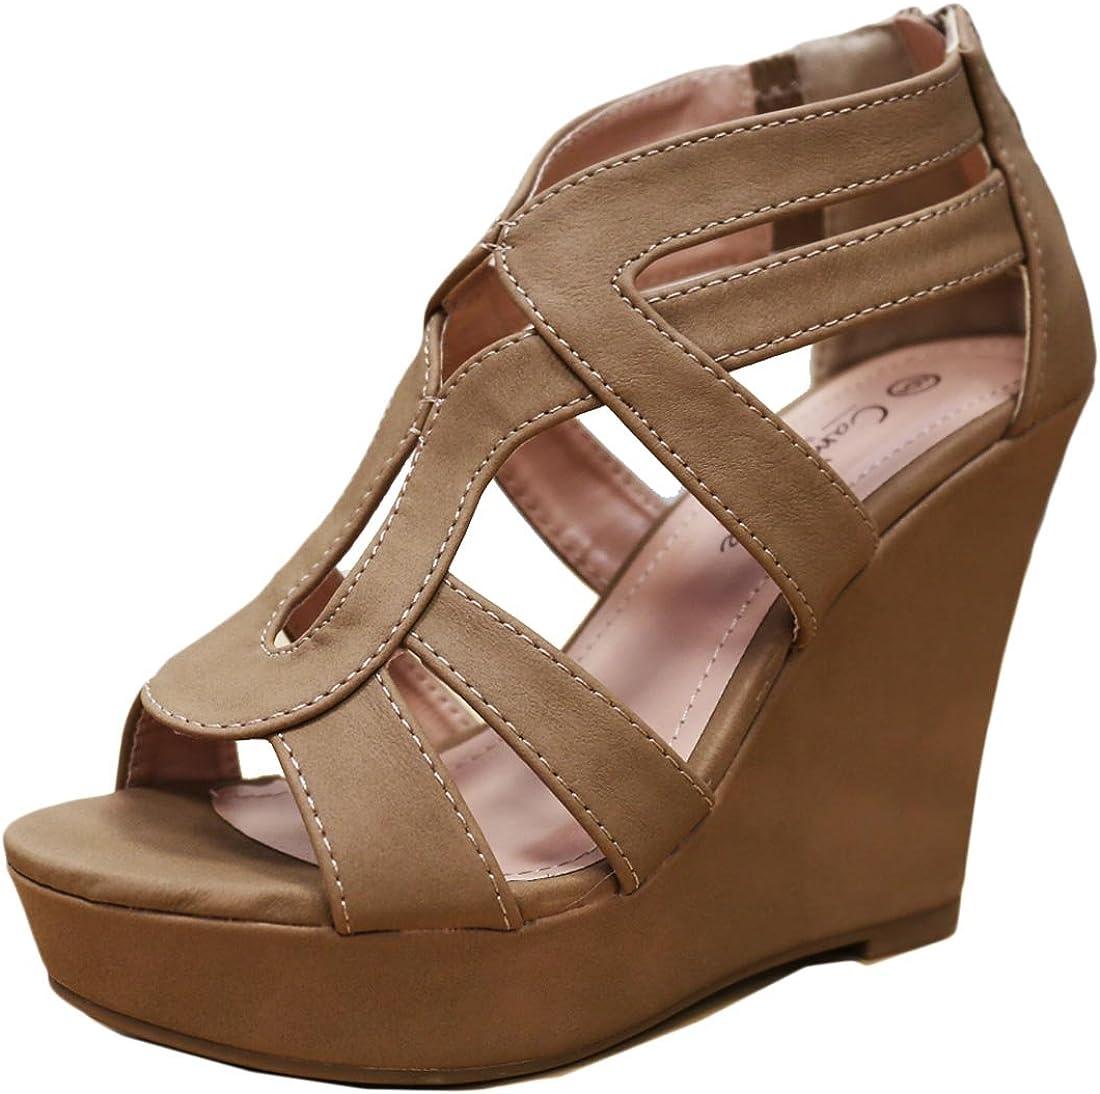 Cambridge Select Womens Open Toe Strappy Platform Wedge Heel Sandal